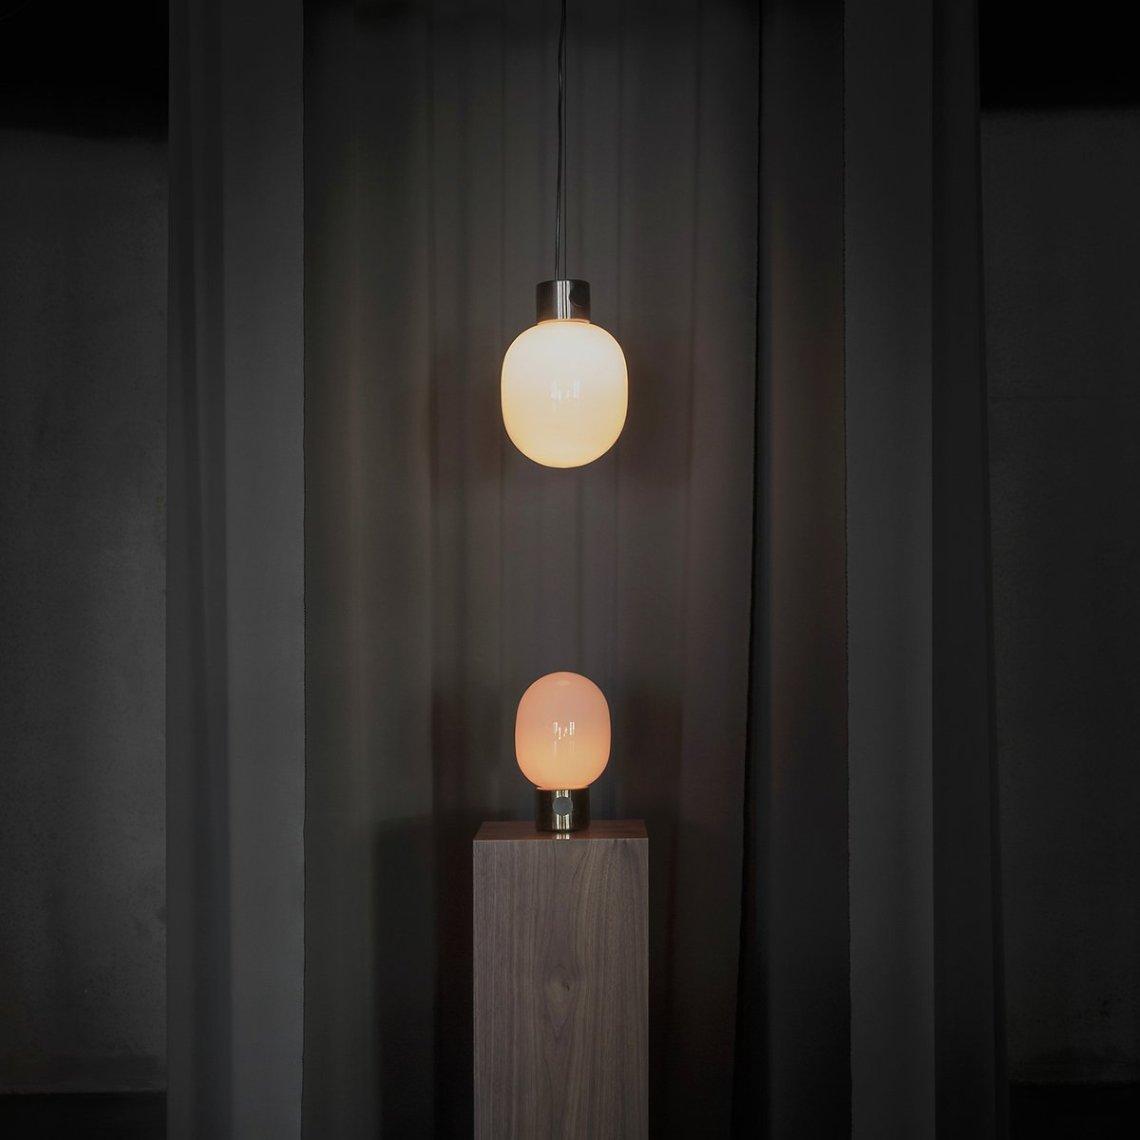 mettallic upper cover hanging lamp